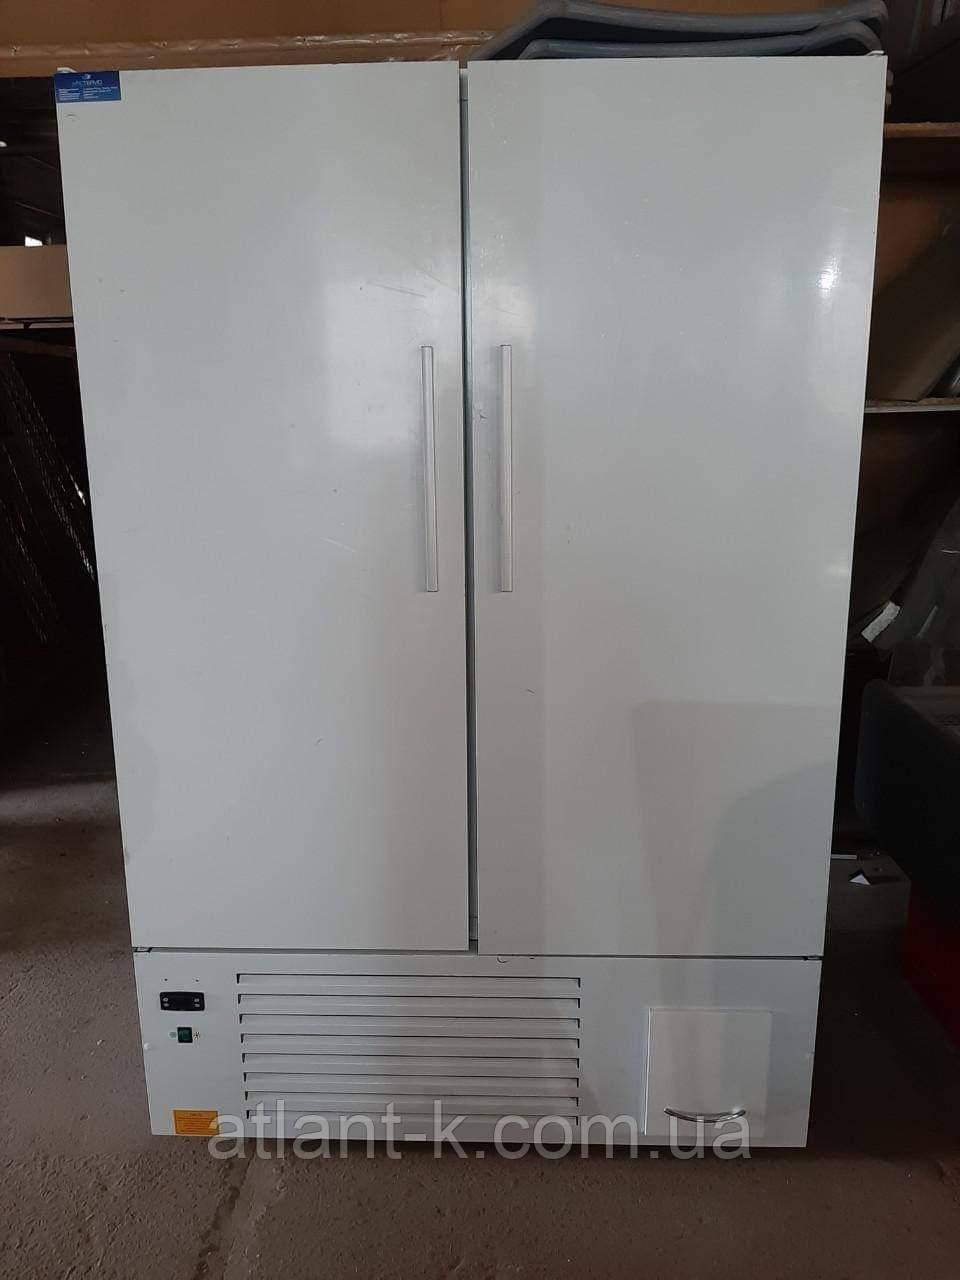 Шкаф холодильный ШХС - 1.0, 1000л, (0..+8), с глухой дверью